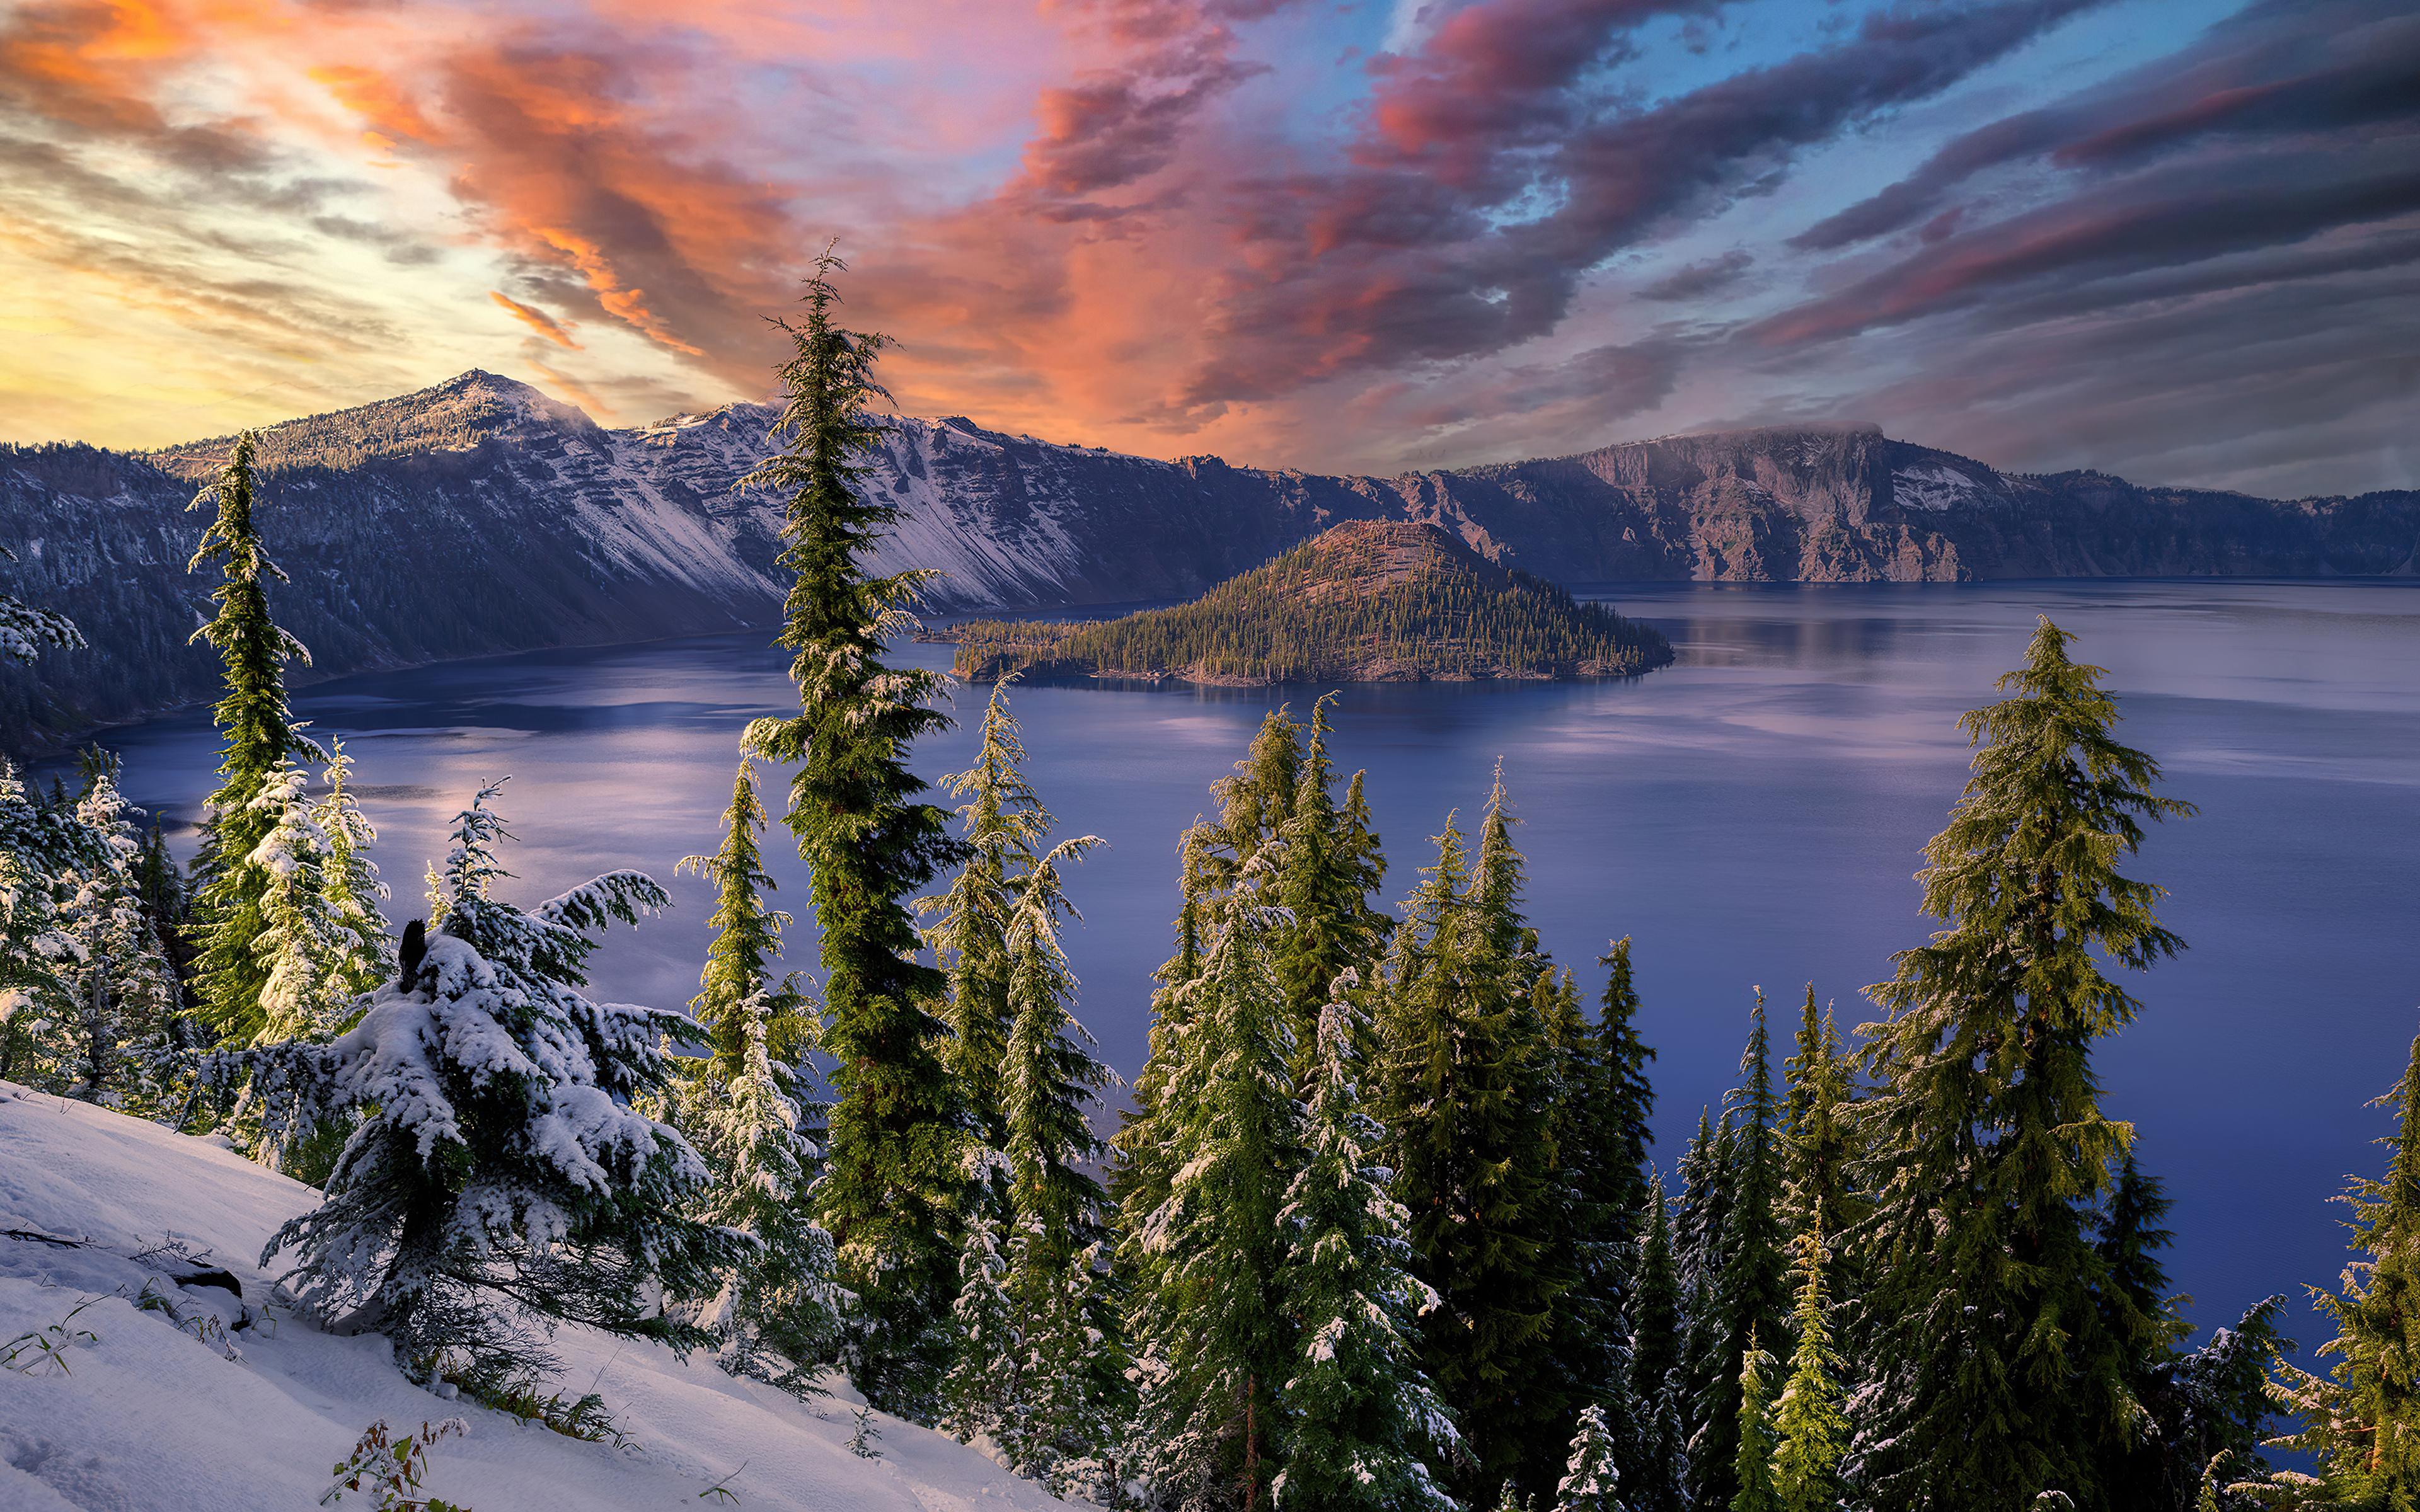 3840x2400 Winter Snow Trees Mountains Landscape Hdr 4k 4k ...